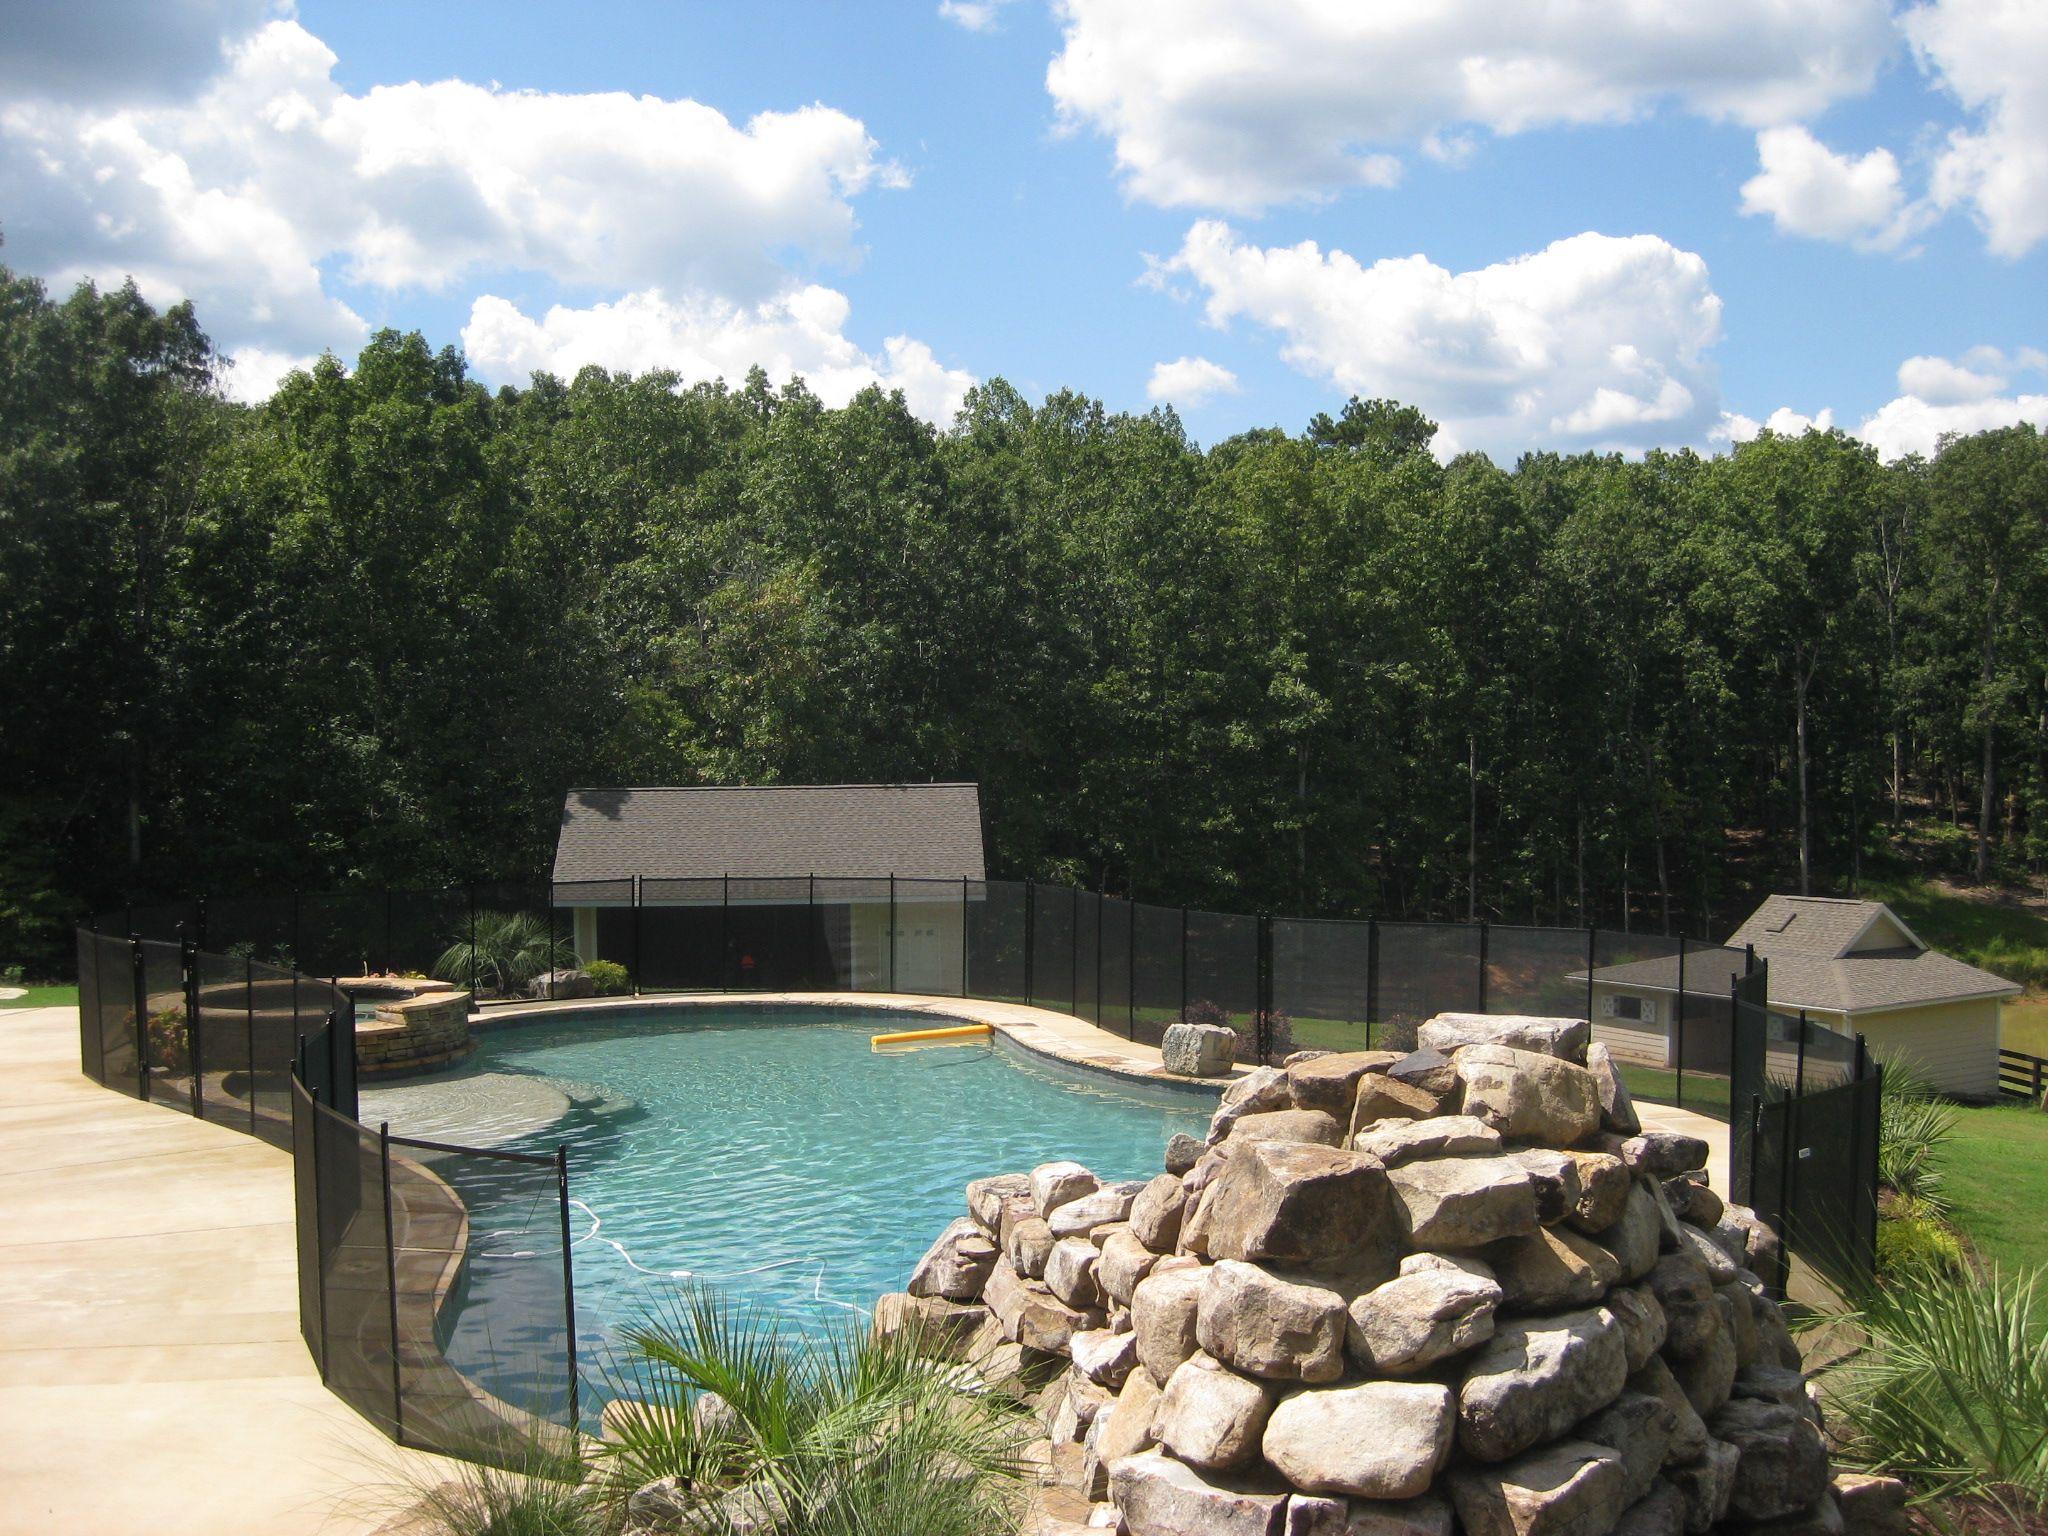 Now that is a safe backyard backyard